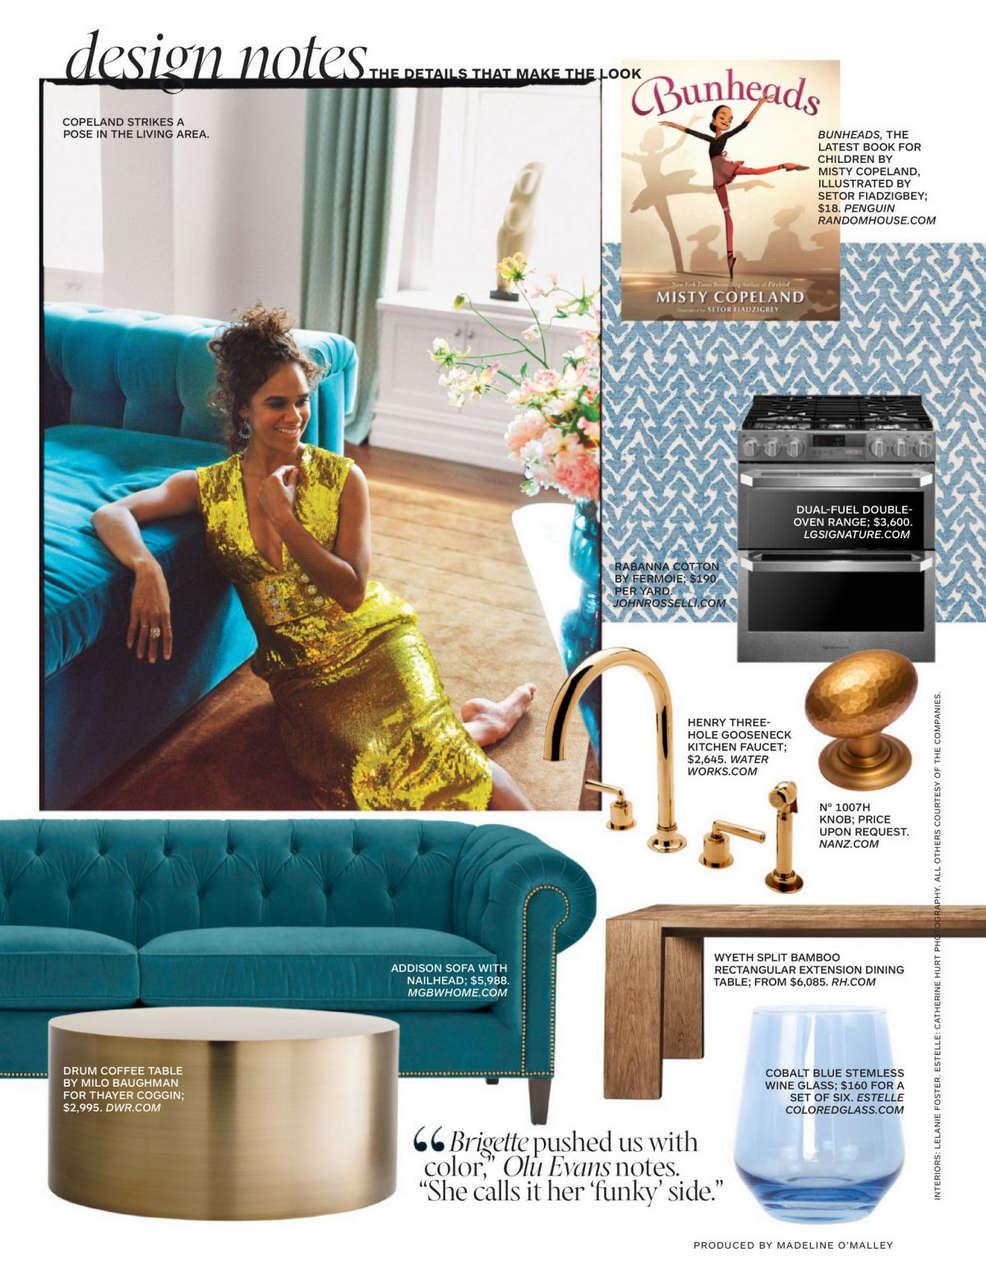 Misty Copeland Architectural Digest Magazine October